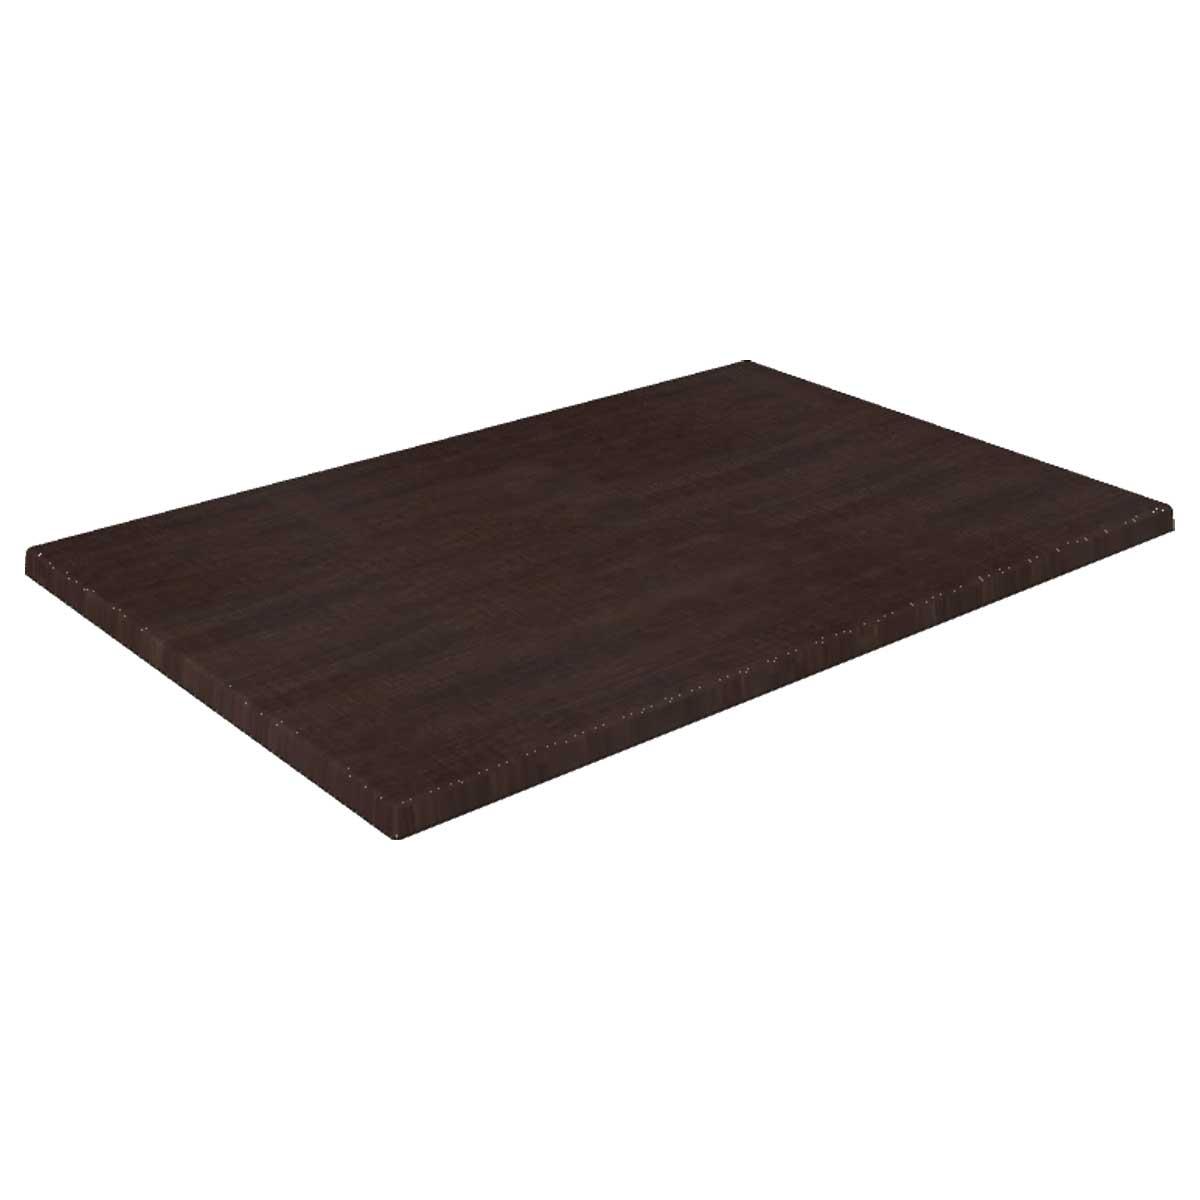 TICLA E120X80 175 - https://www.werzalit.com/fr/produit/plateau-de-table-classic-werzalit-e-110x70-175-palisade-lodge/